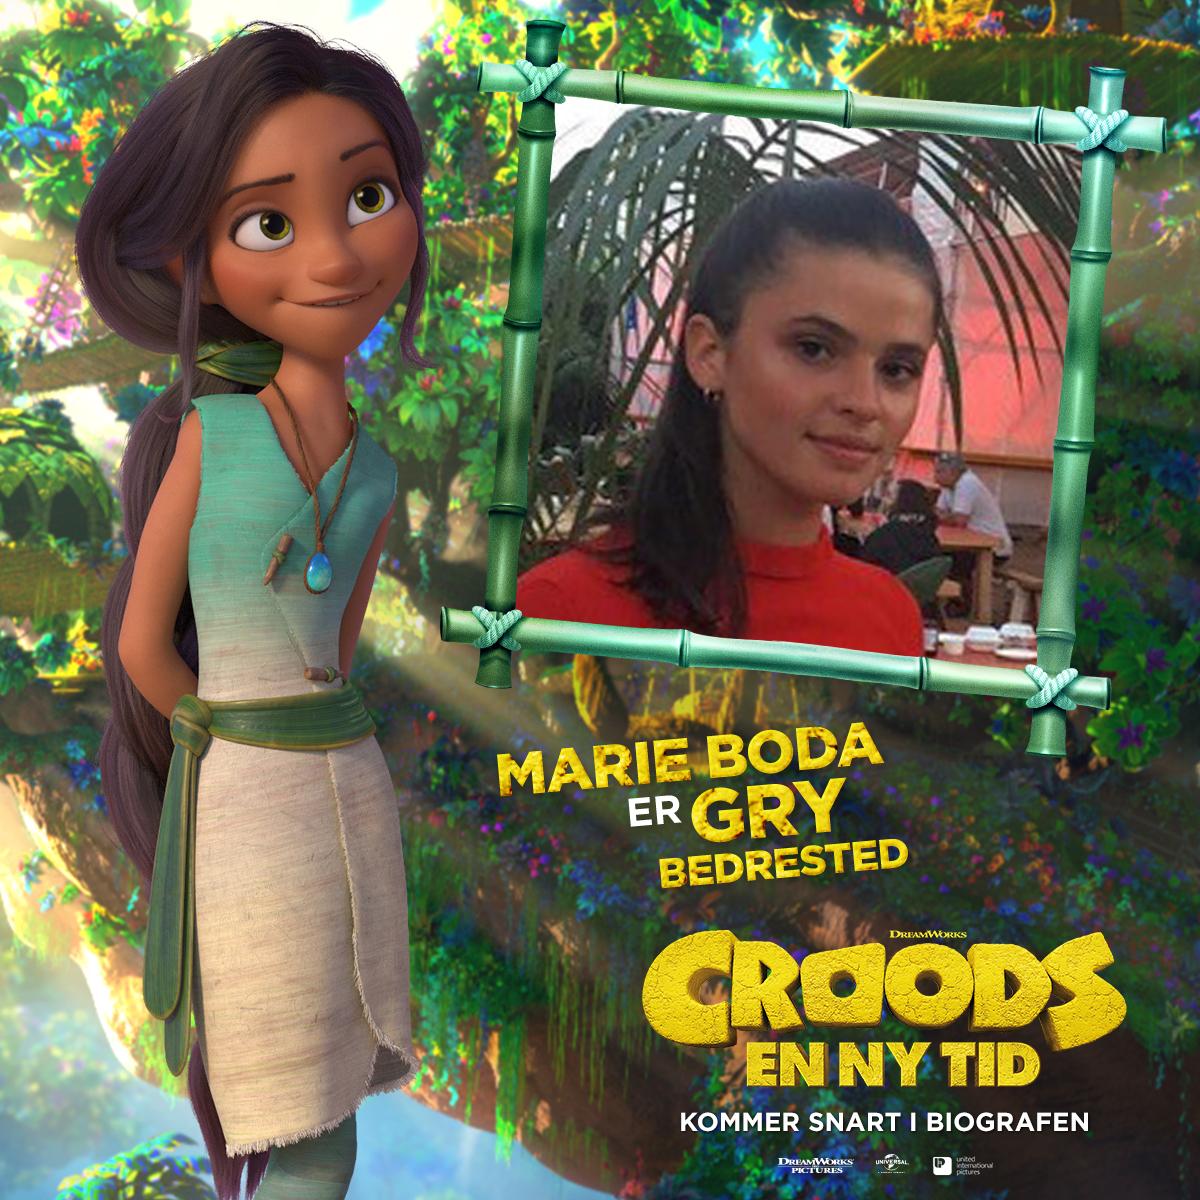 Croods - Karakterkort - Gry (Marie Boda)